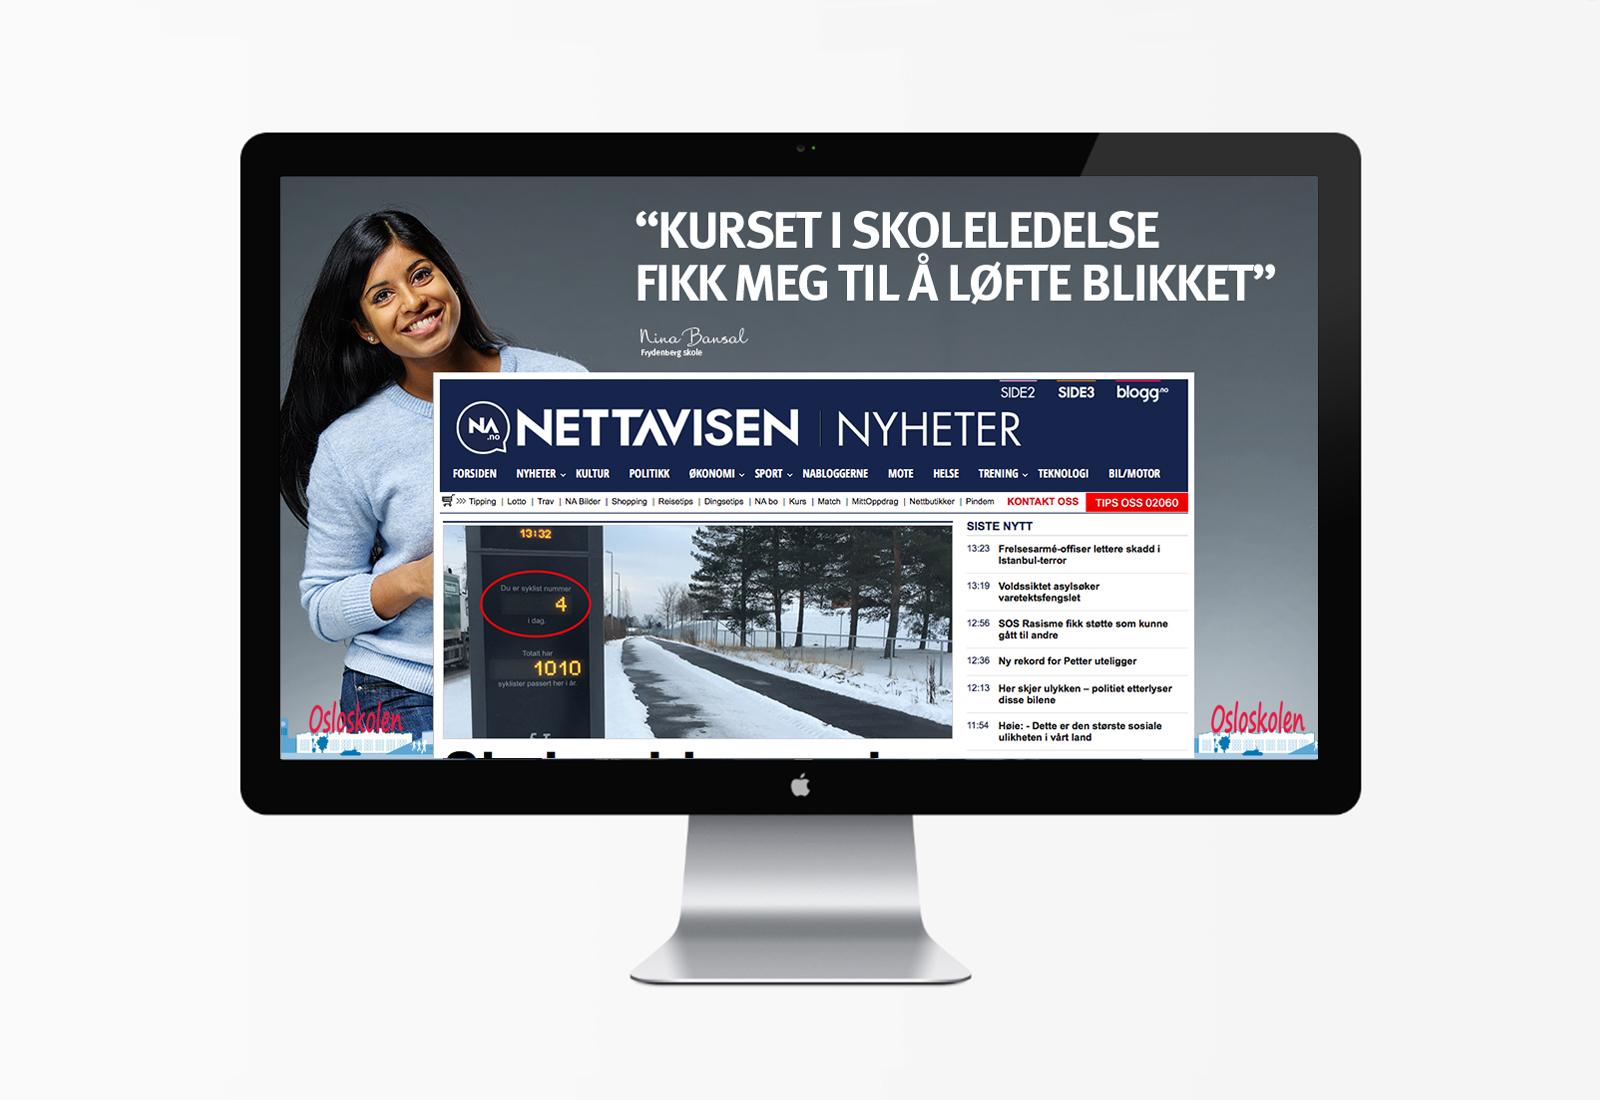 Osloskolen_web-desktop_1905x1310 5